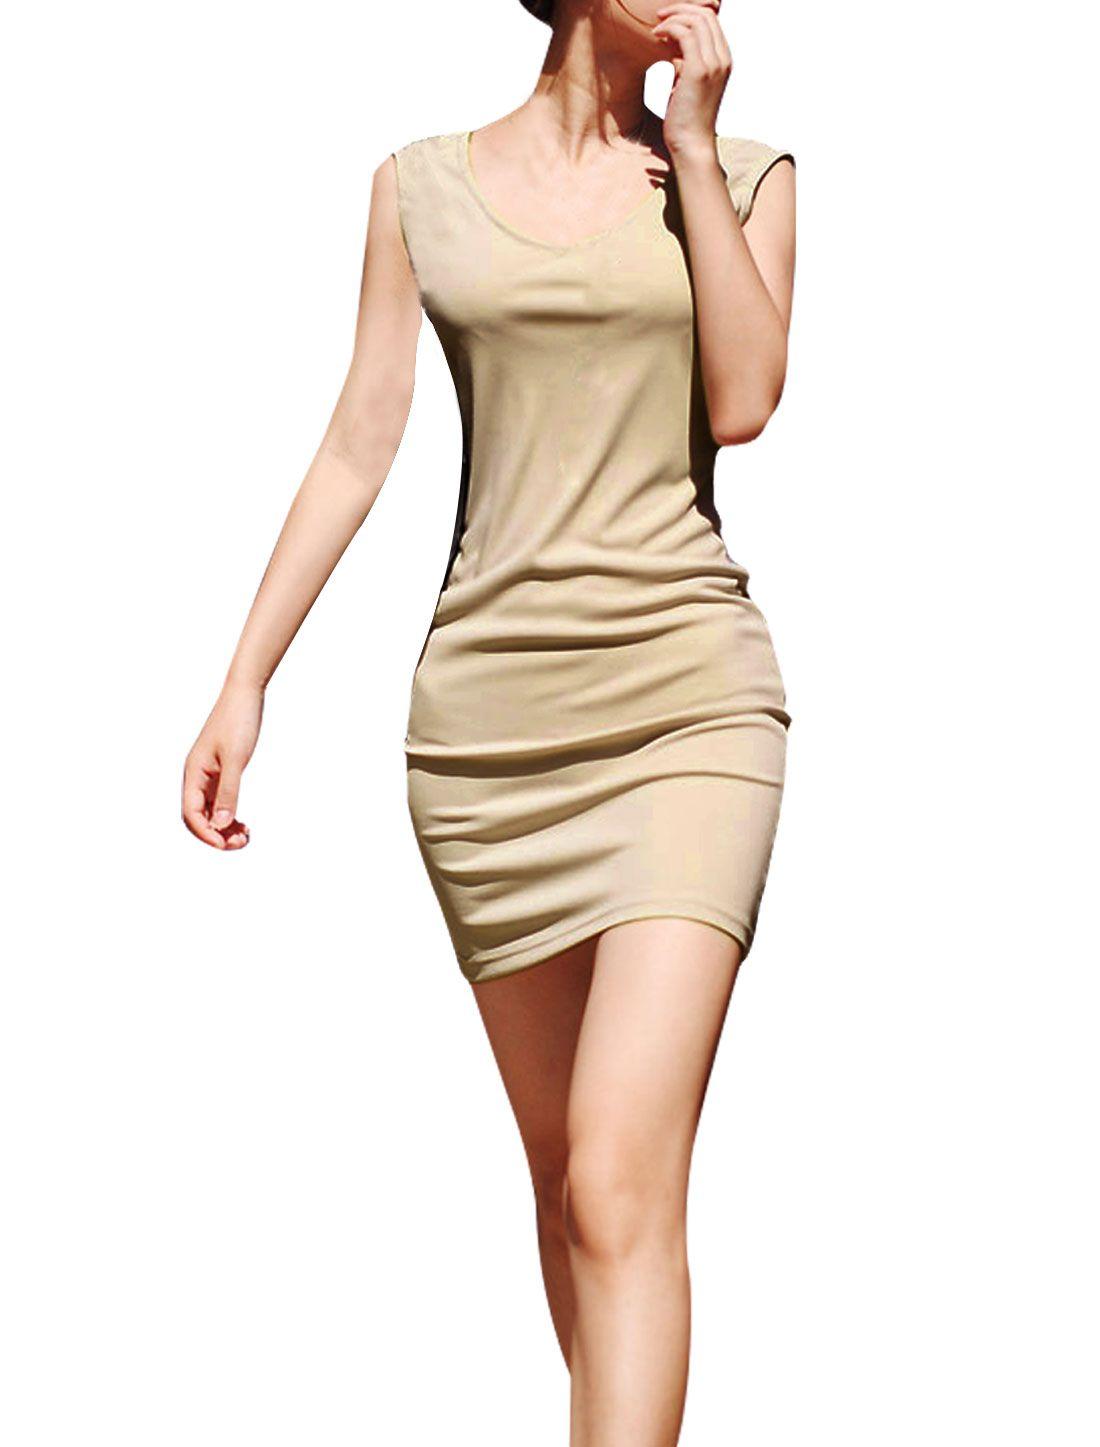 Allegra K Juniors Solid V Neck Mini Maxi Dress Beige (Size M / 9)